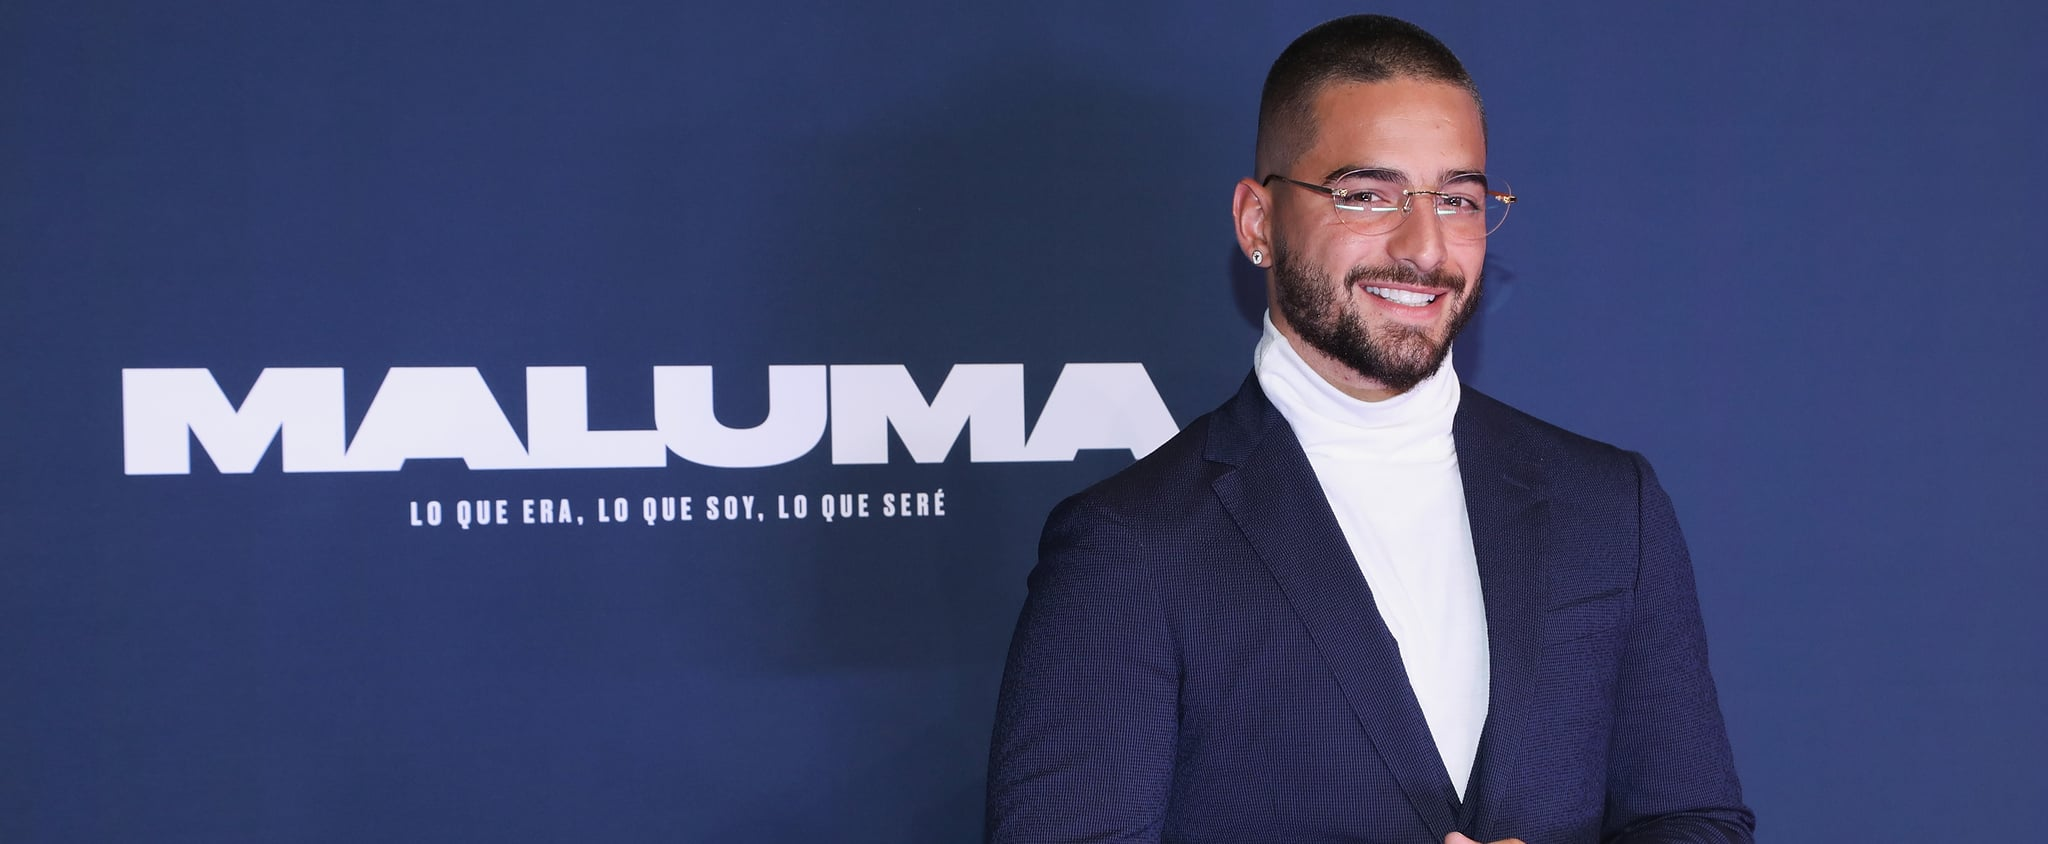 Maluma Interview For Hispanic Heritage Month